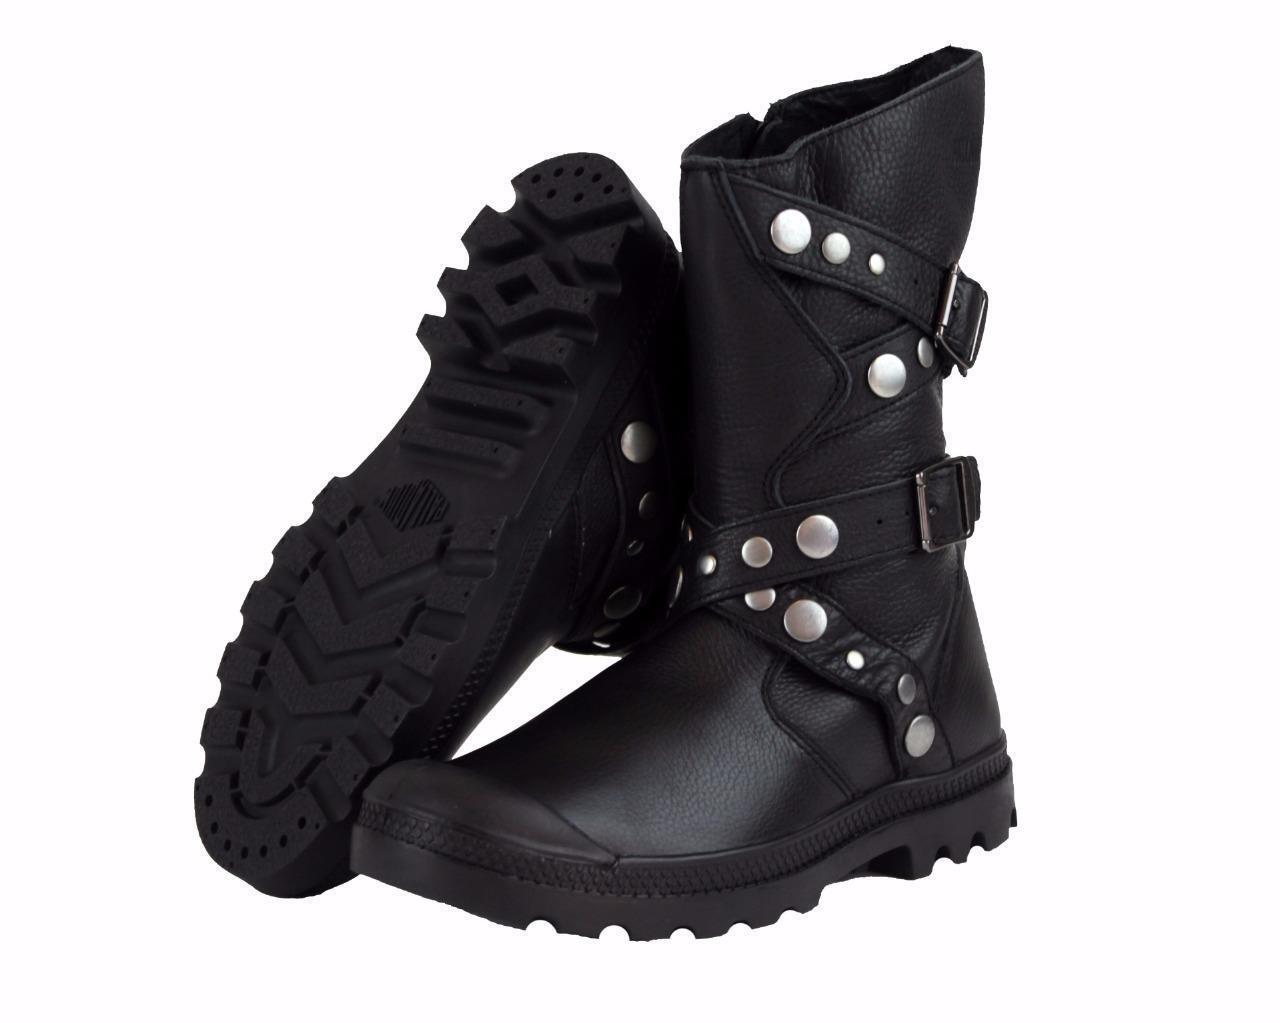 New Women's Palladium Polegate Leather Boots US Size 6-11 Black 93264-001